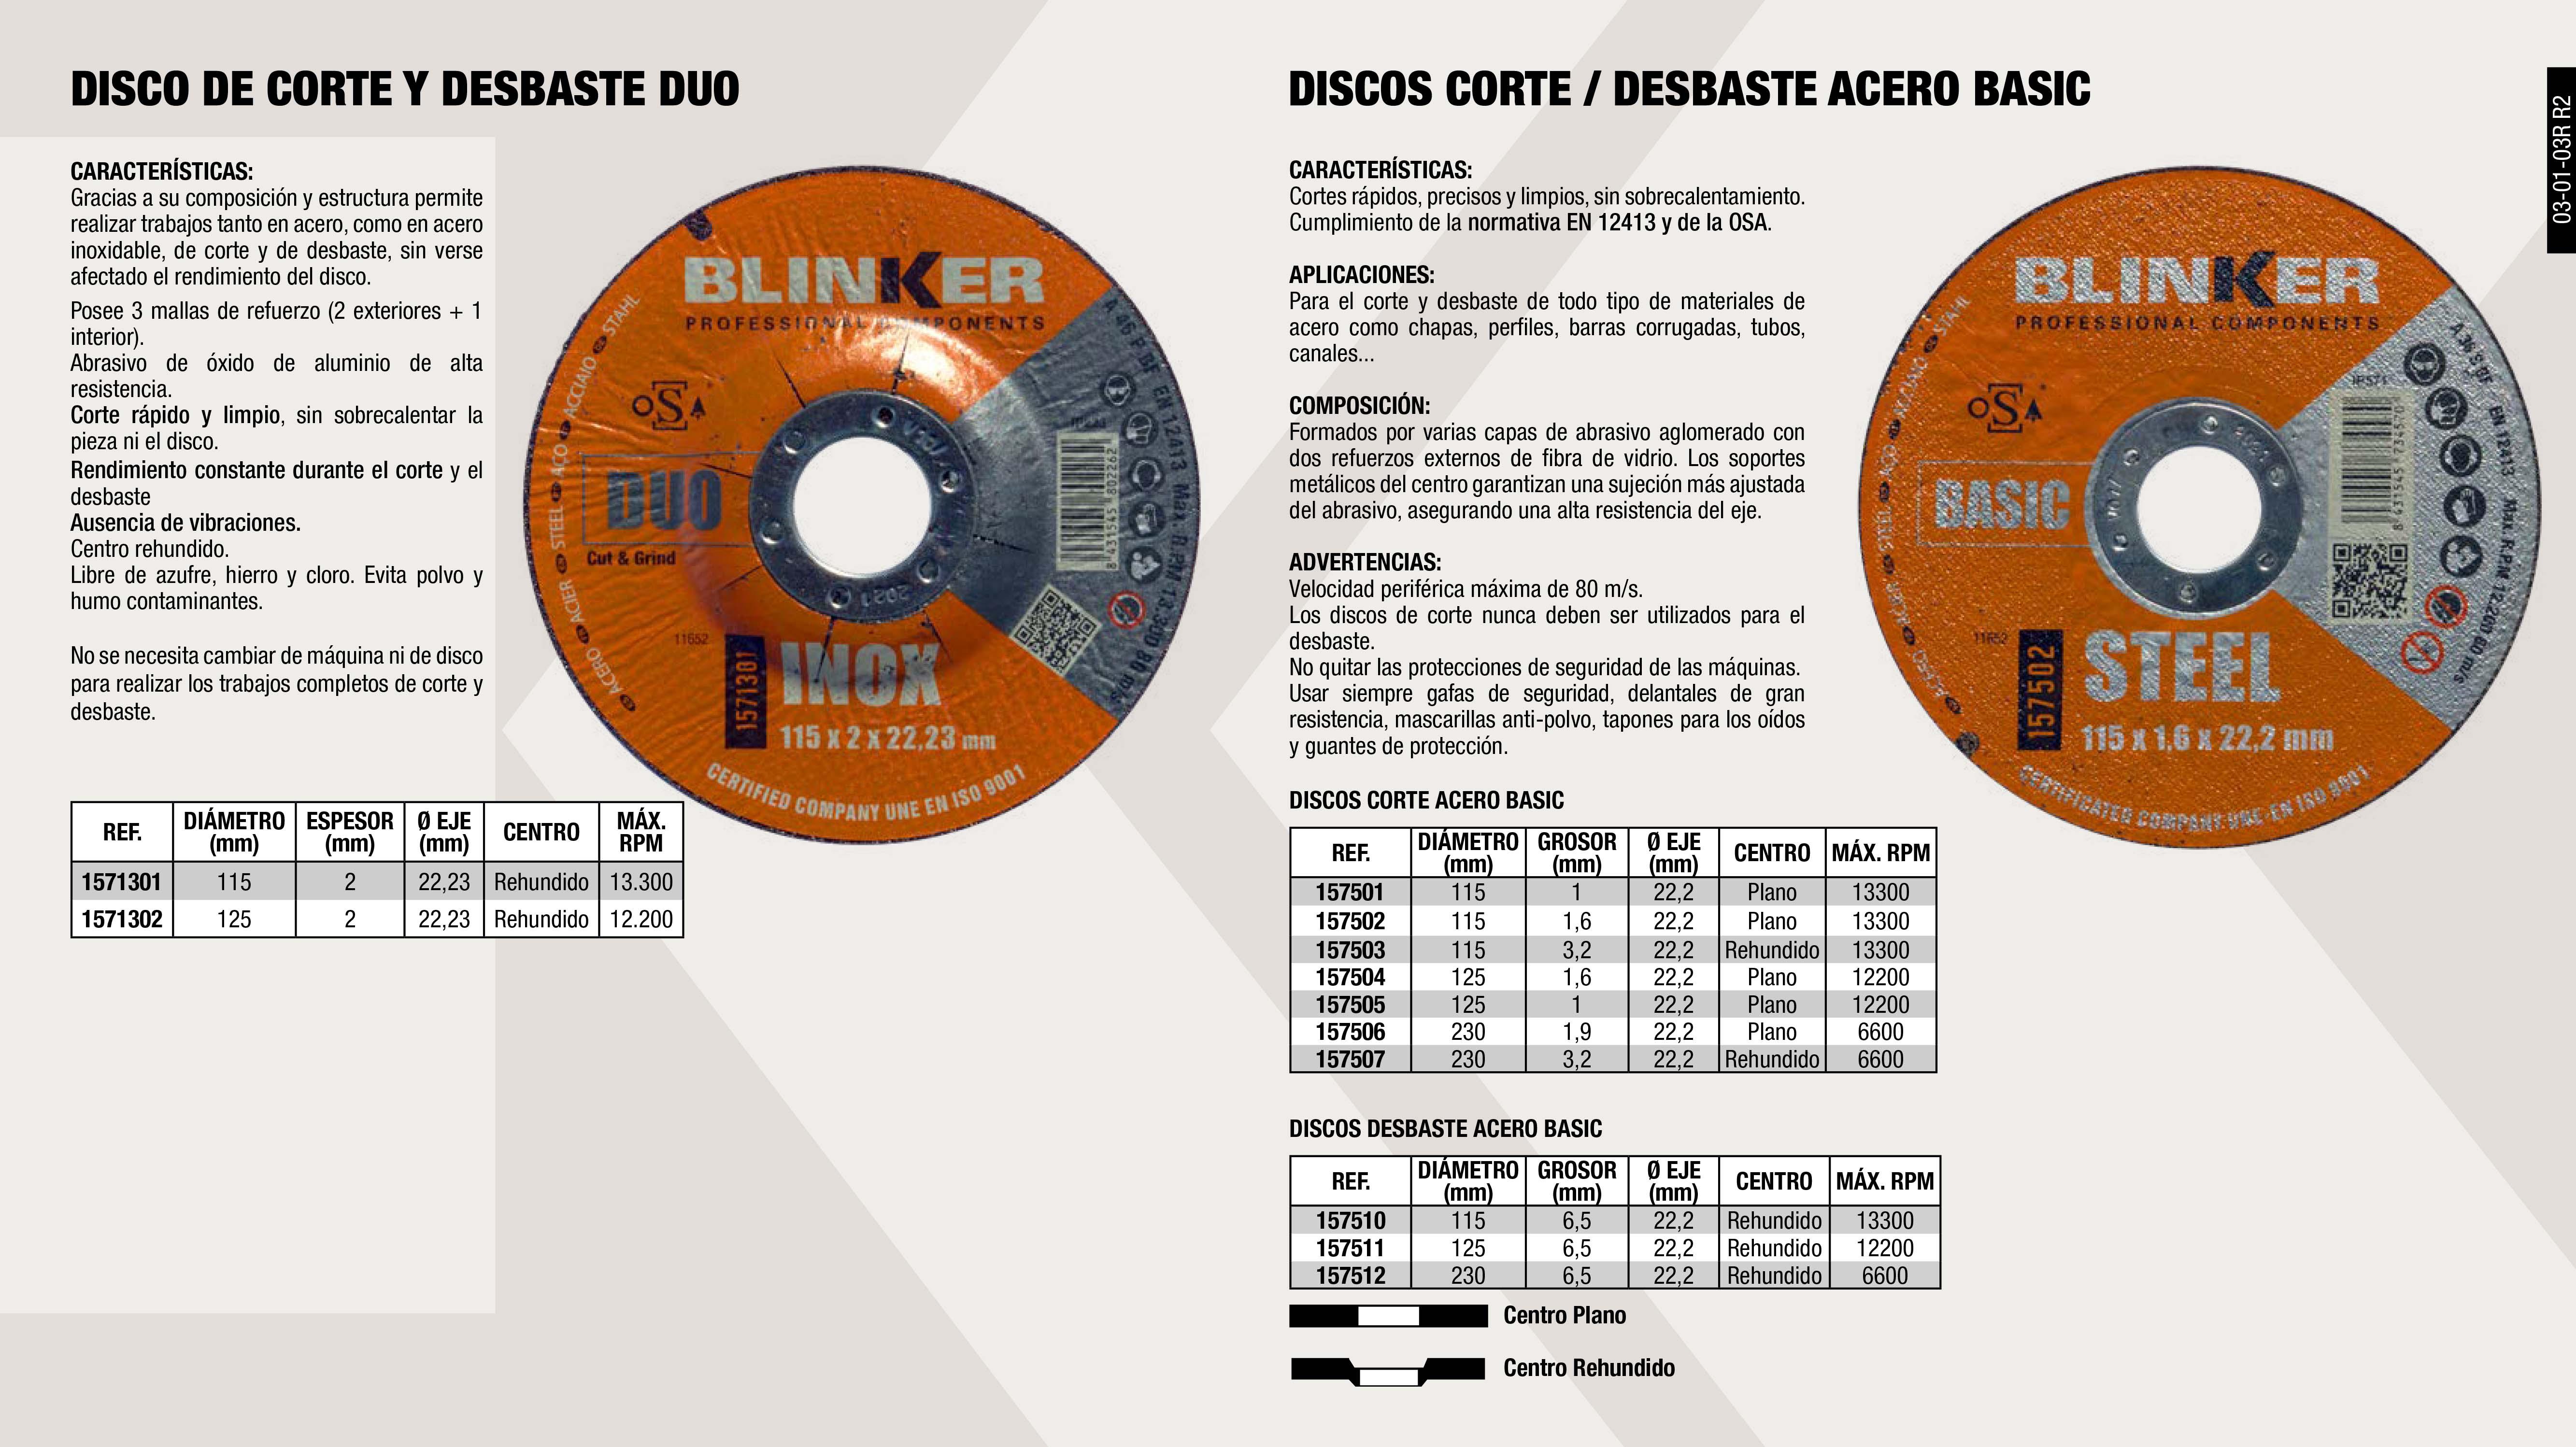 DISCO DUO ACERO/INOX 115X2X22,2                             ,  DISCO DESBASTE ACERO BASIC  125X6,5X22,2                    ,  DISCO CORTE ACERO BASIC 115X1.6X22.2                        ,  DISCO CORTE ACERO BASIC 230X1.9X22.2                        ,  DISCO CORTE ACERO BASIC 230X3.2X22.2                        ,  DISCO DESBASTE ACERO BASIC 230X6,5X22.2                     ,  DISCO DUO ACERO/INOX 125X2X22,2                             ,  DISCO CORTE ACERO BASIC 125X1.6X22.2                        ,  DISCO CORTE ACERO BASIC 125X1X22.2                          ,  DISCO CORTE ACERO BASIC 115X1X22.2                          ,  DISCO CORTE ACERO BASIC 115X3.2X22.2                        ,  DISCO DESBASTE ACERO BASIC 115X6.5X22.2                     ,